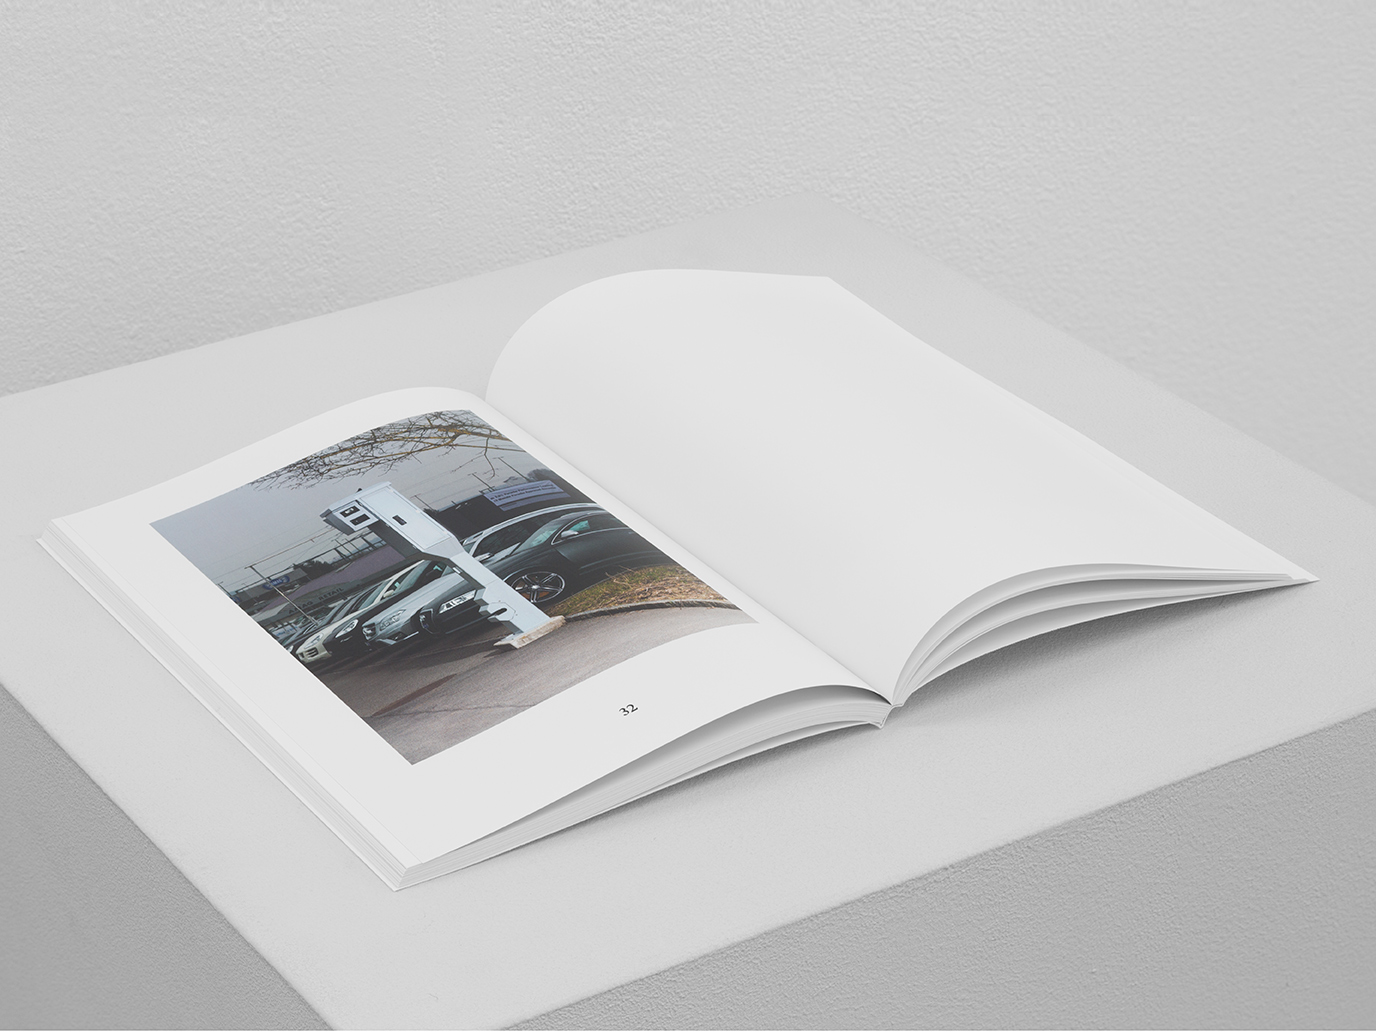 Fotografie und Buchgestaltung «Multa Nova»